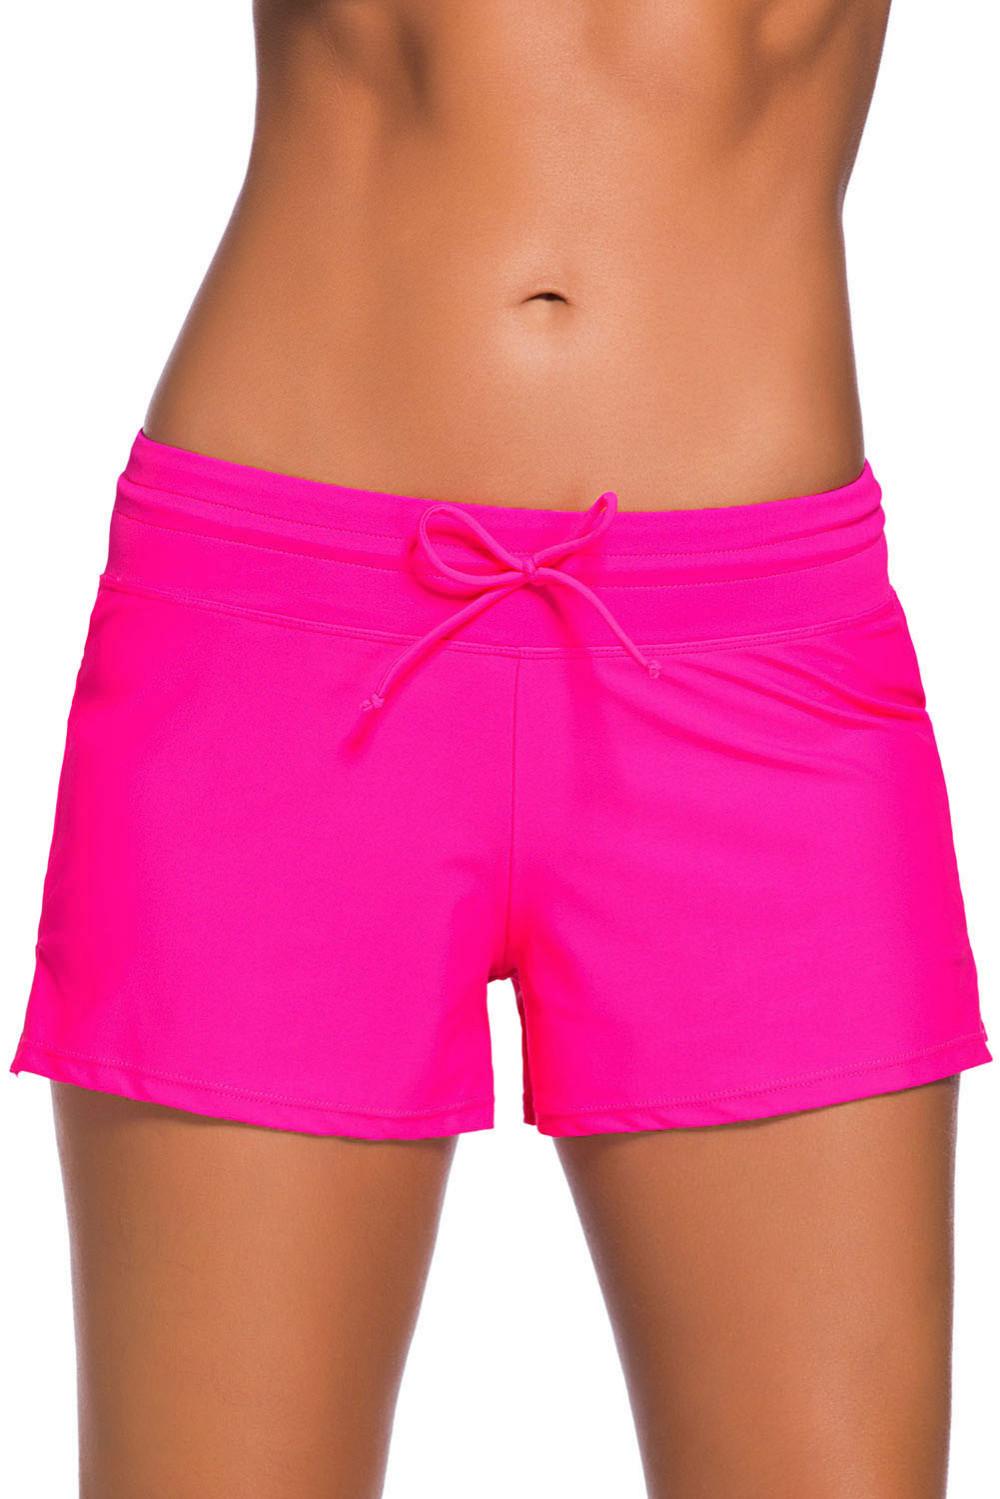 Rosy-Women-Swim-Boardshort-LC41977-6-1